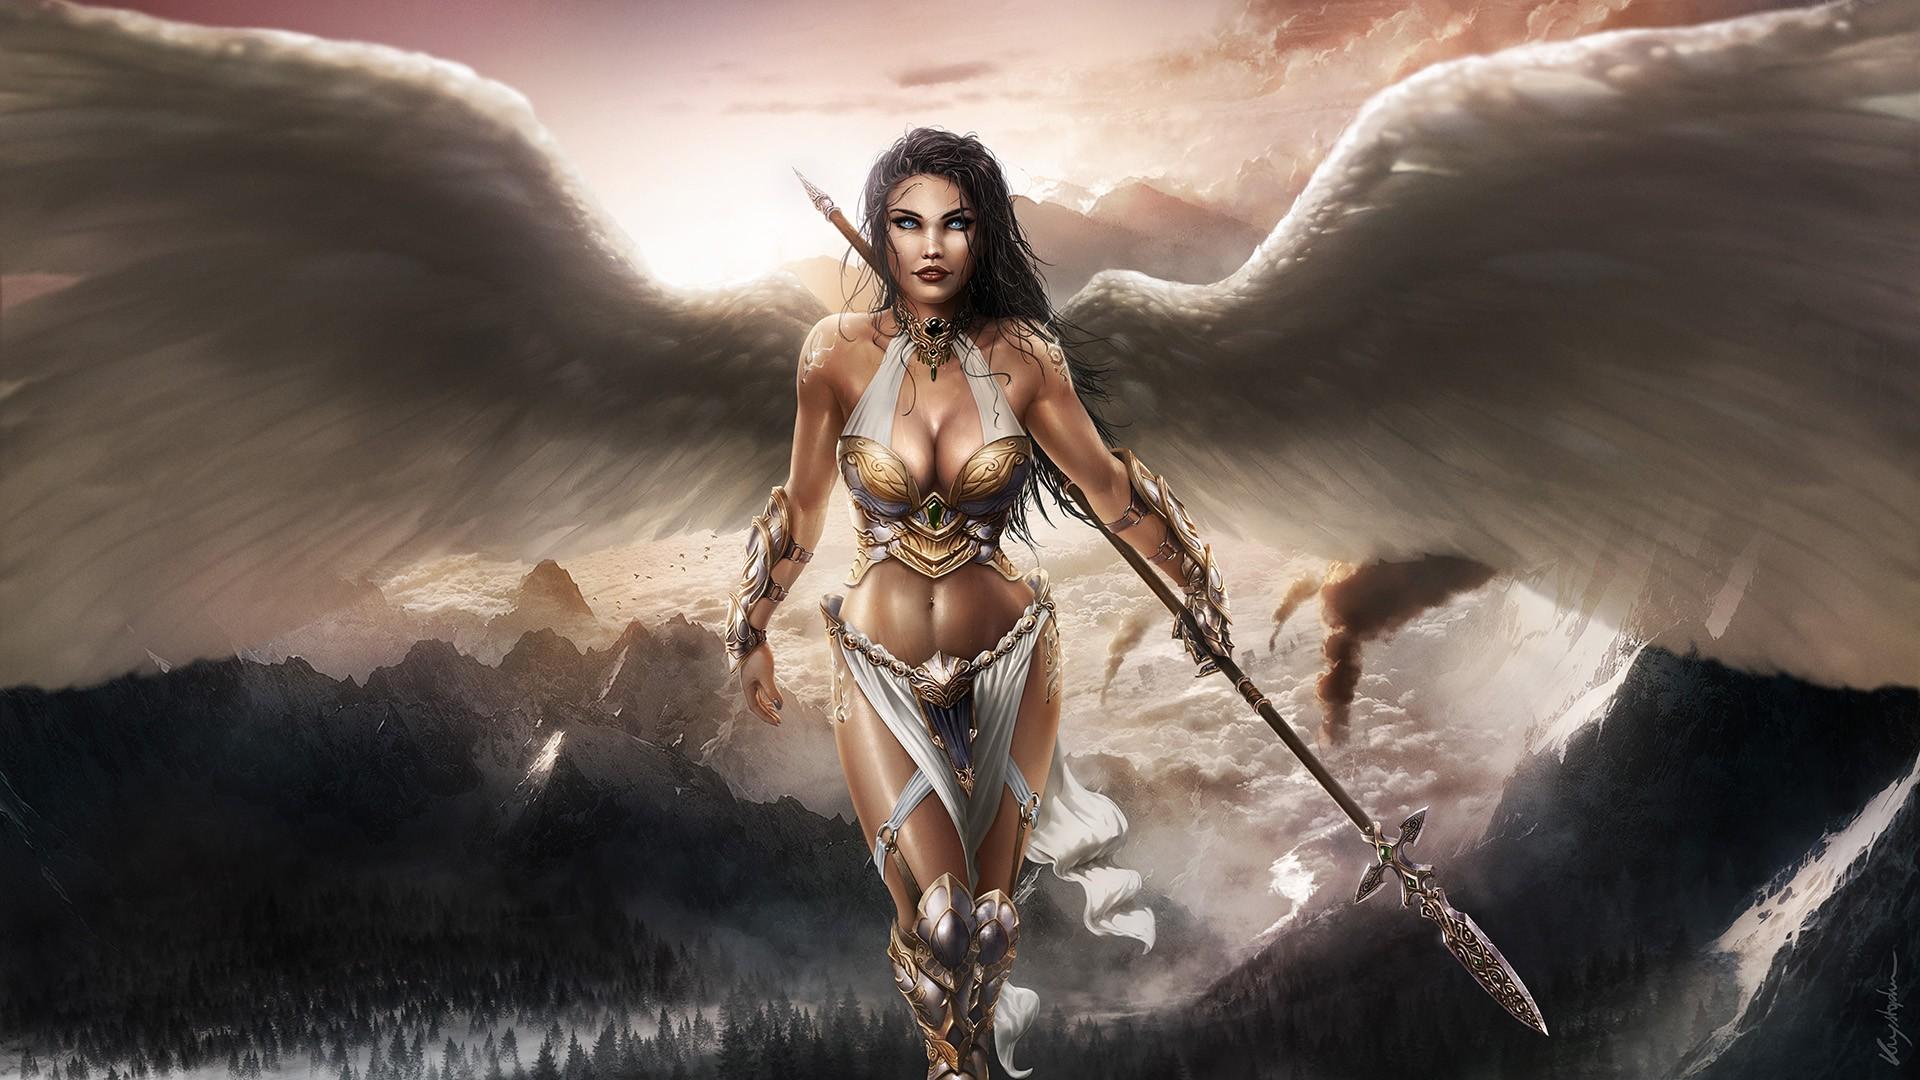 Wallpaper trees landscape forest mountains women - Fantasy female warrior artwork ...